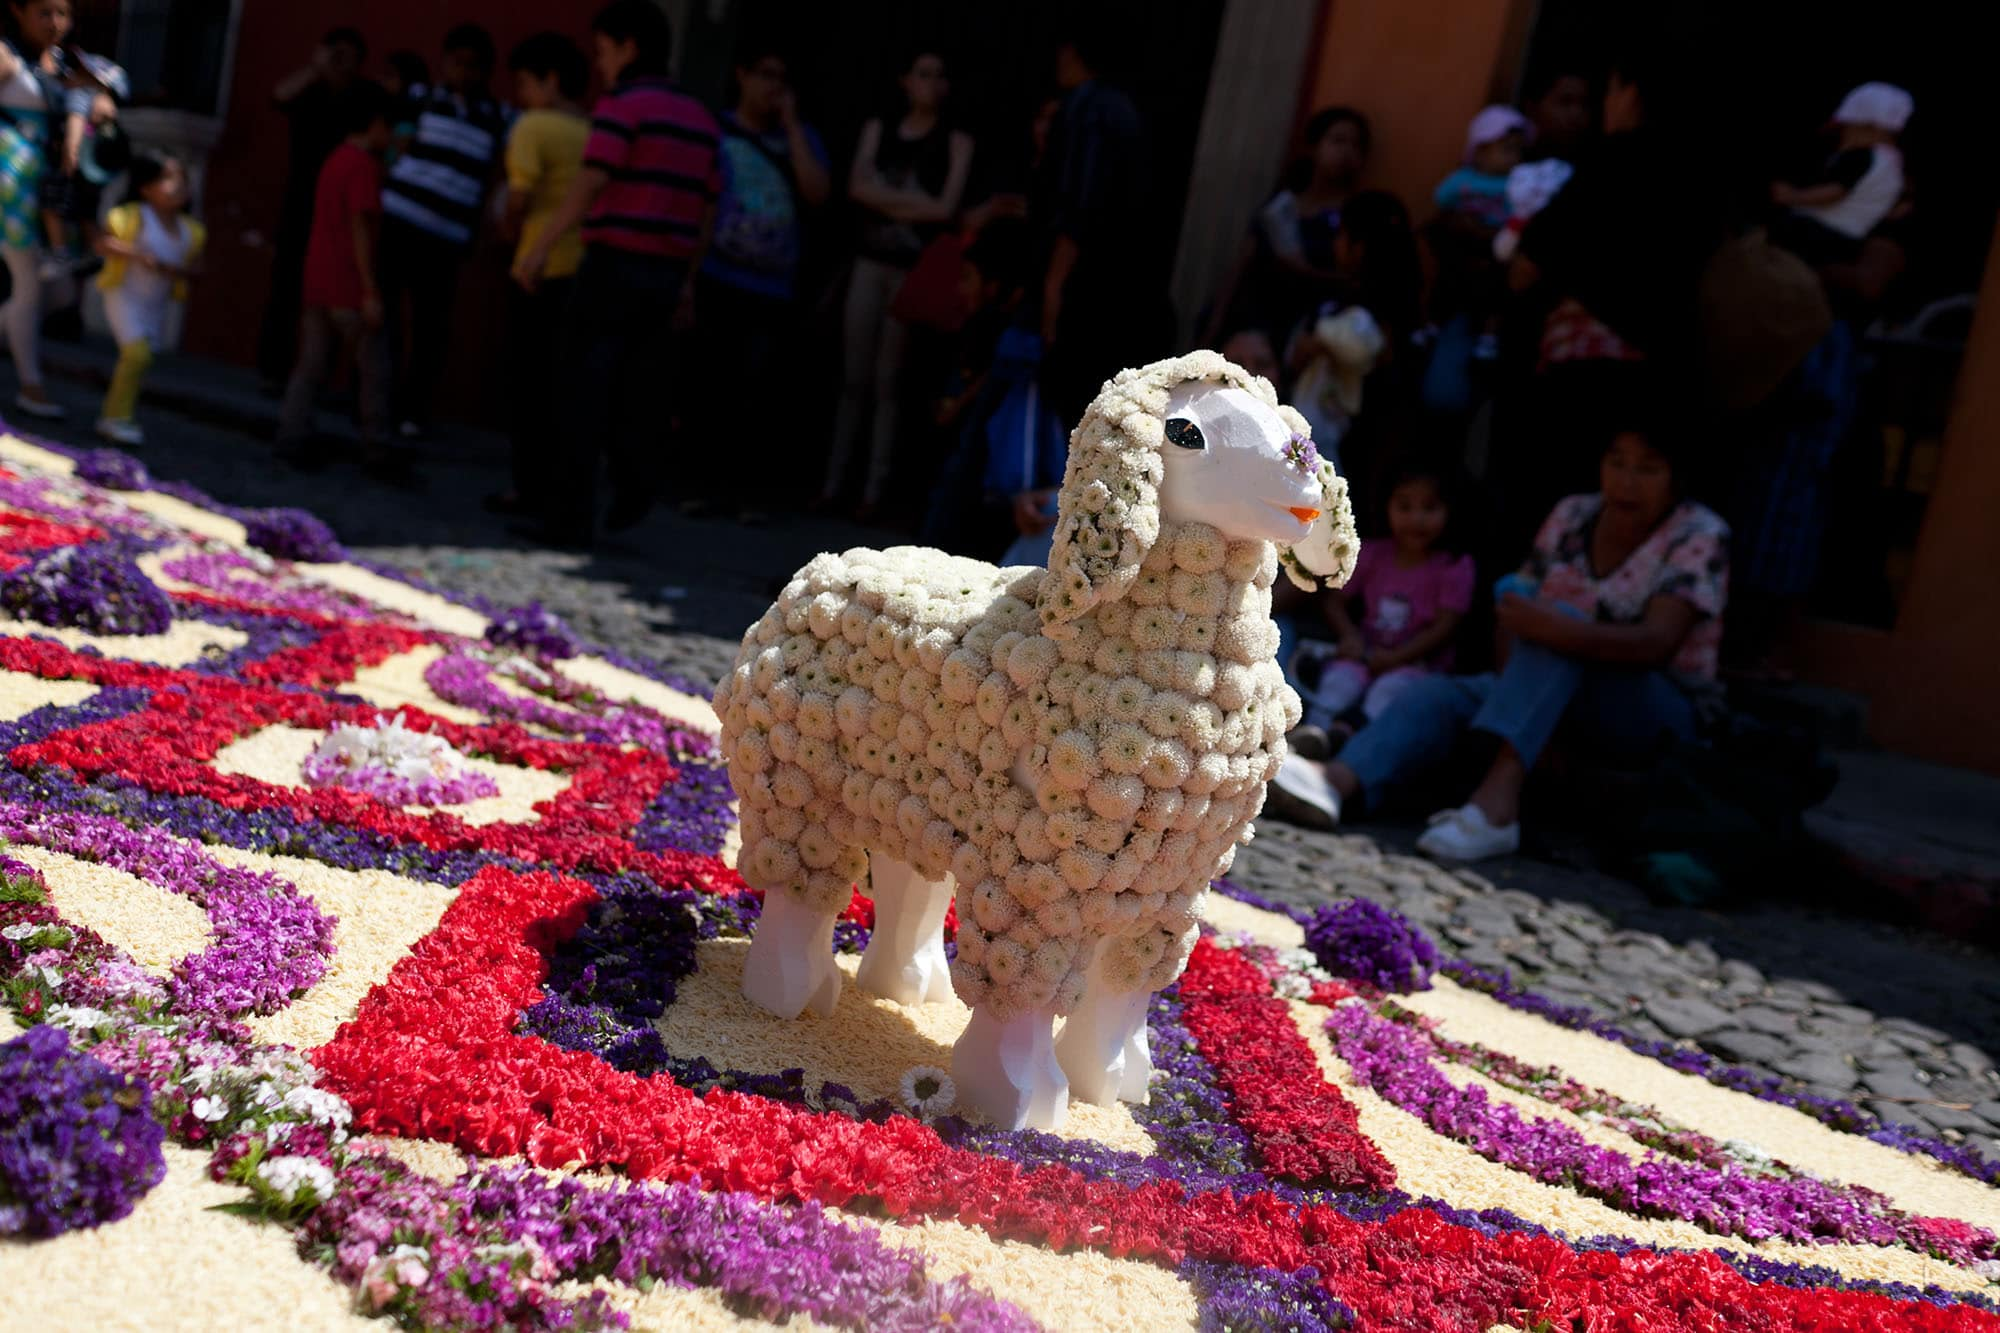 Alfombras de Semana Santa  for Lent Processions in Antigua, Guatemala.